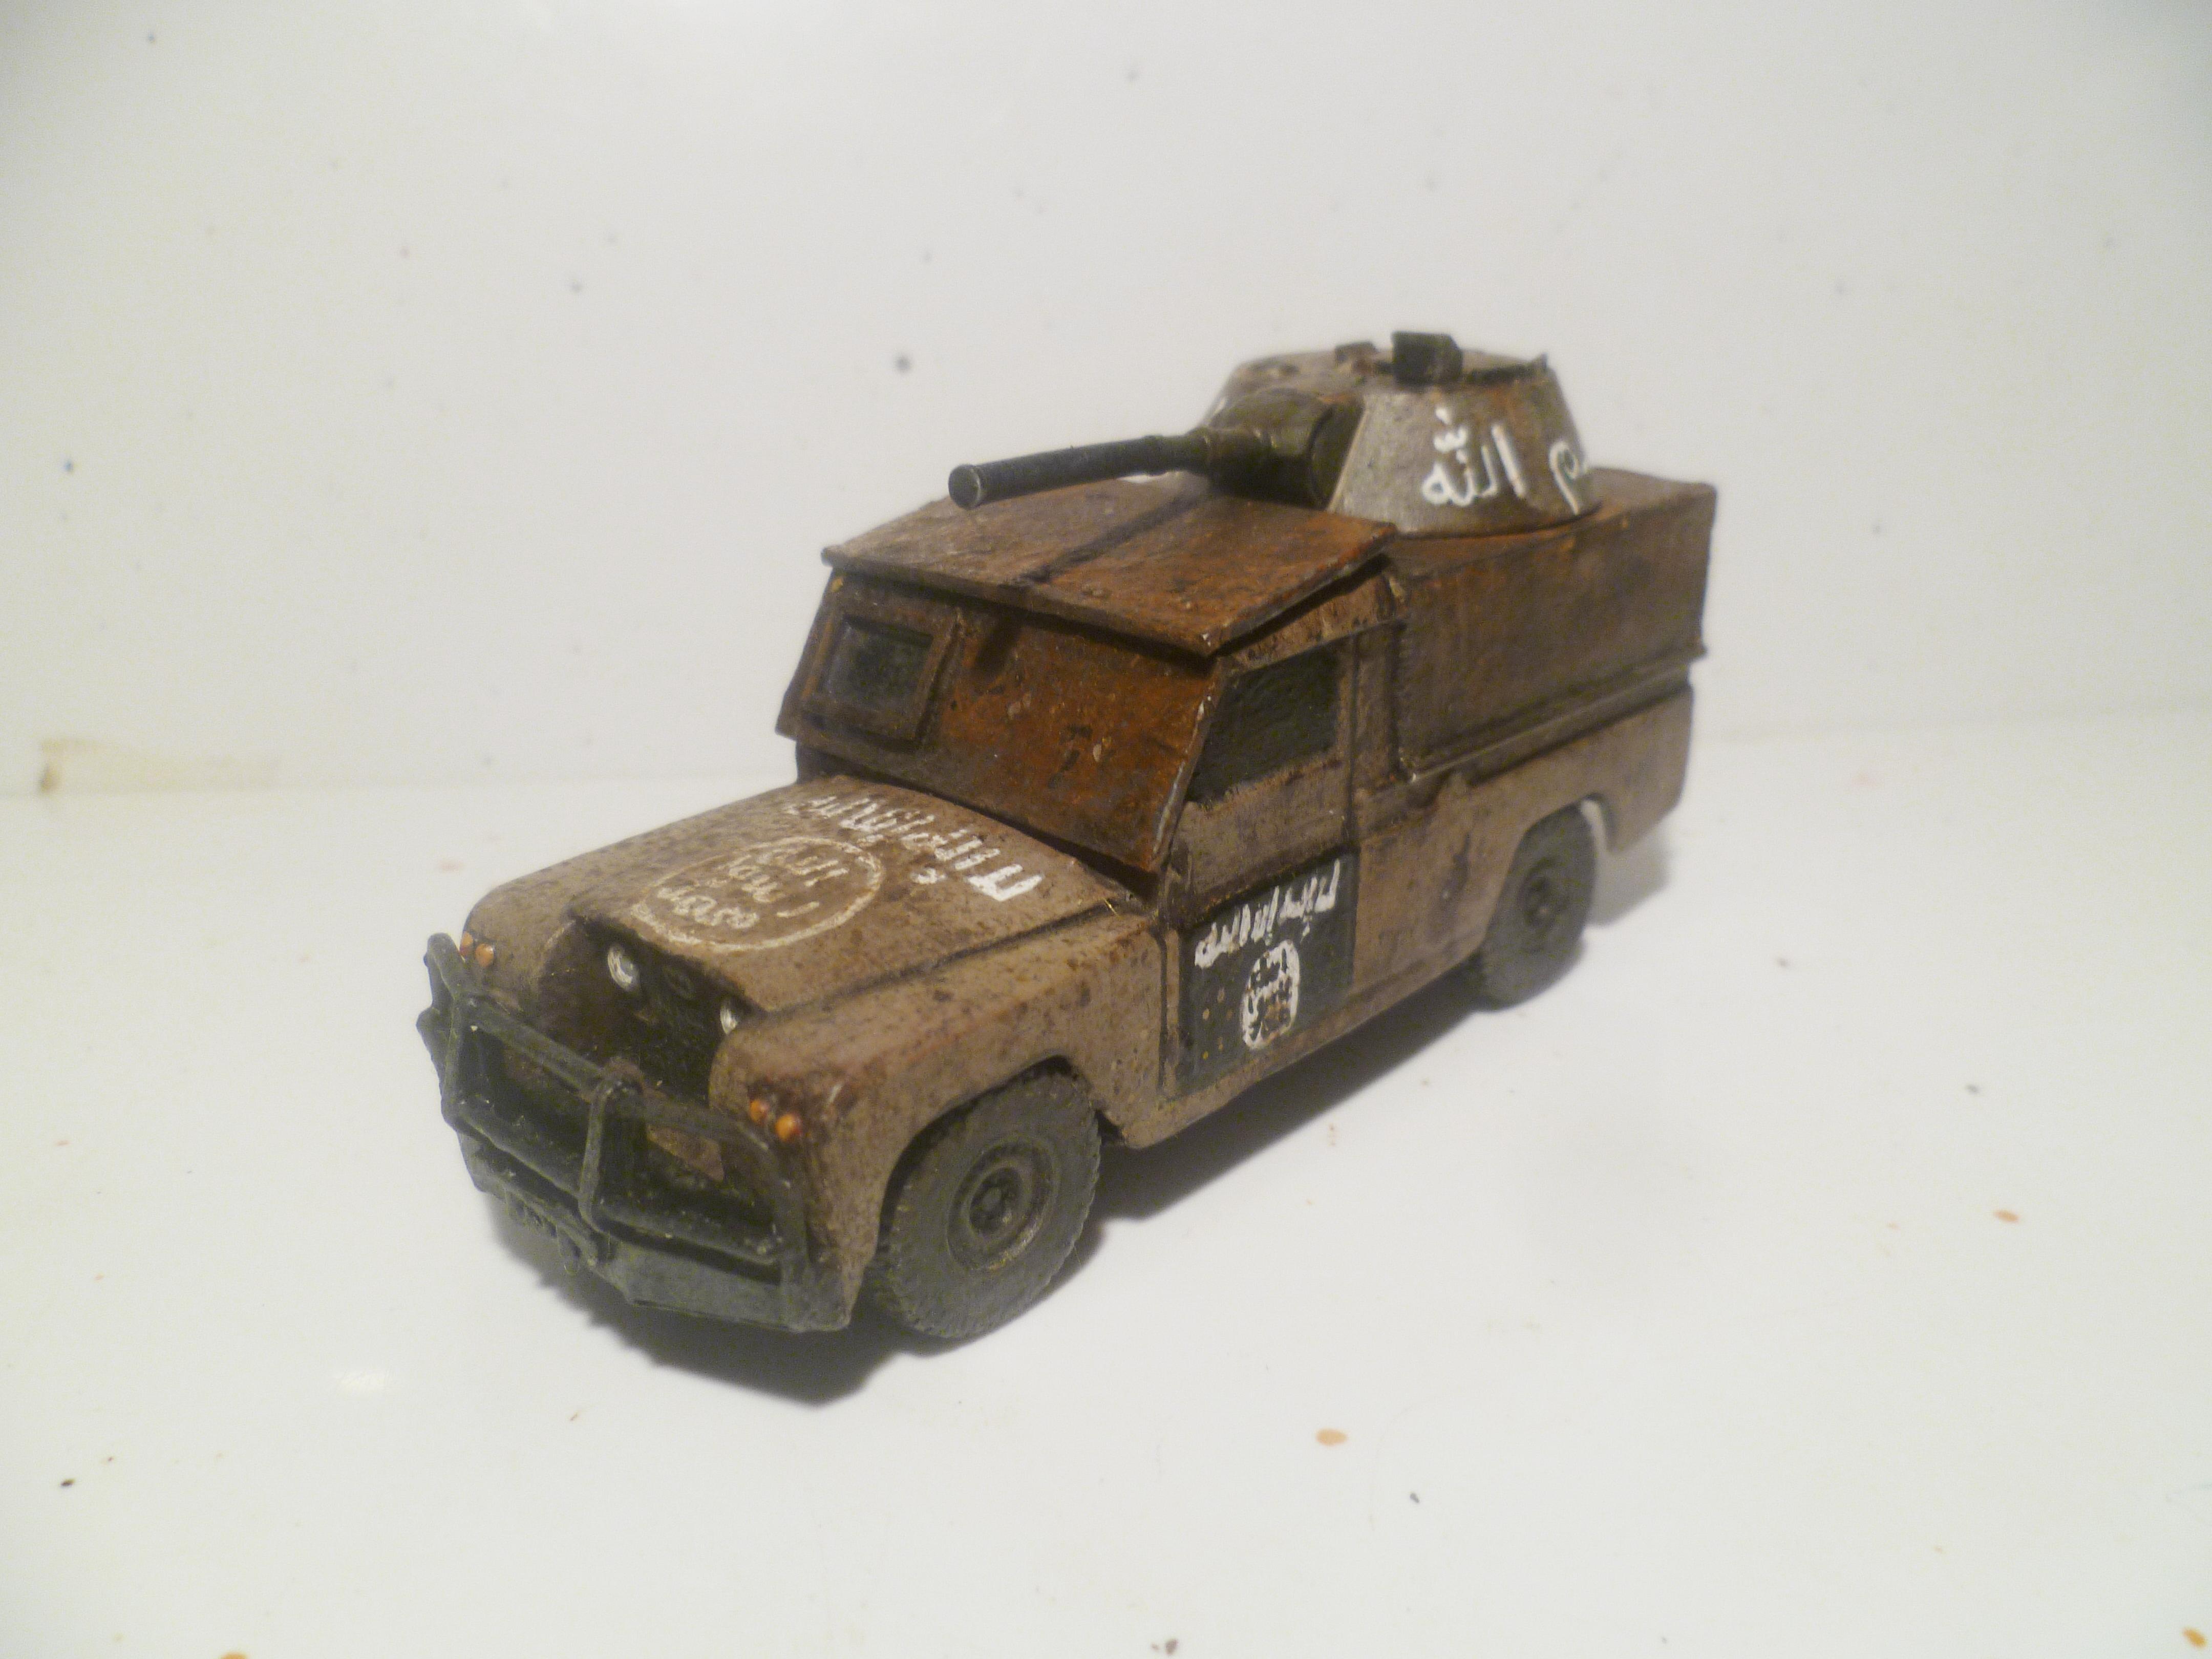 28mm, Arab, Bmp, Conversion, Desert, Insurgent, Middle East, Modern, Soviet, Technical, Vehicle